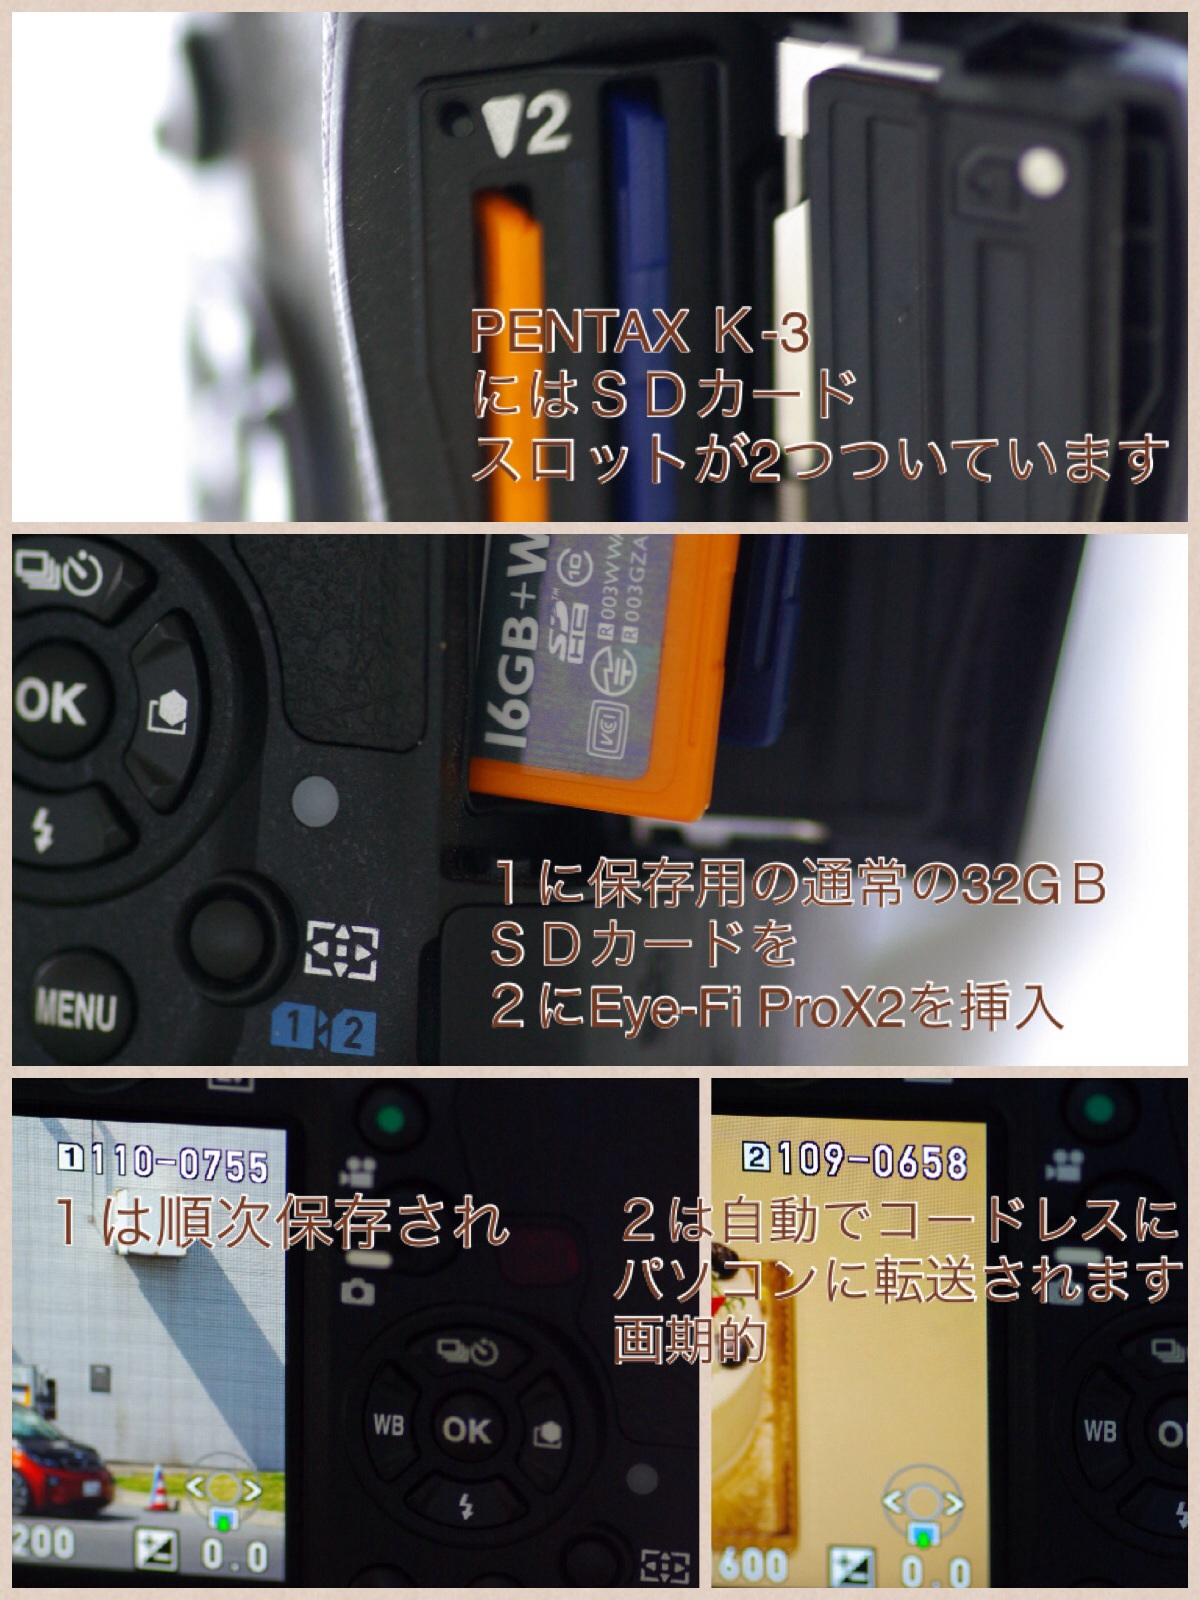 Eye-Fi PROX2